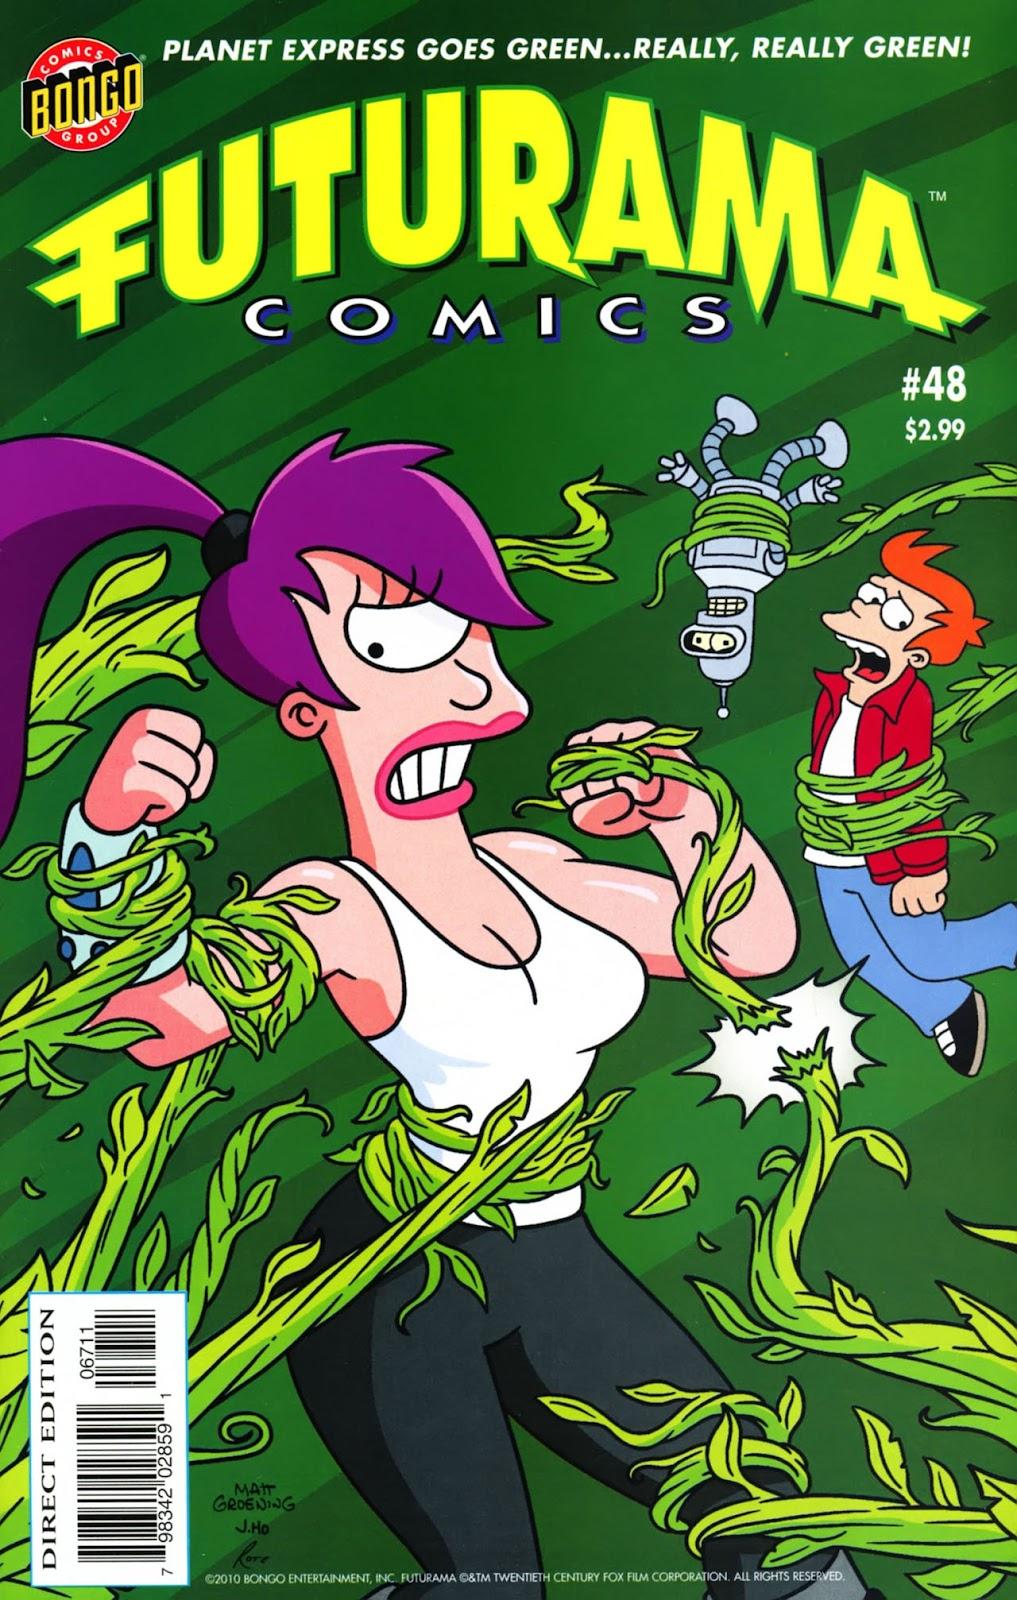 Futurama Comics issue 48 - Page 1